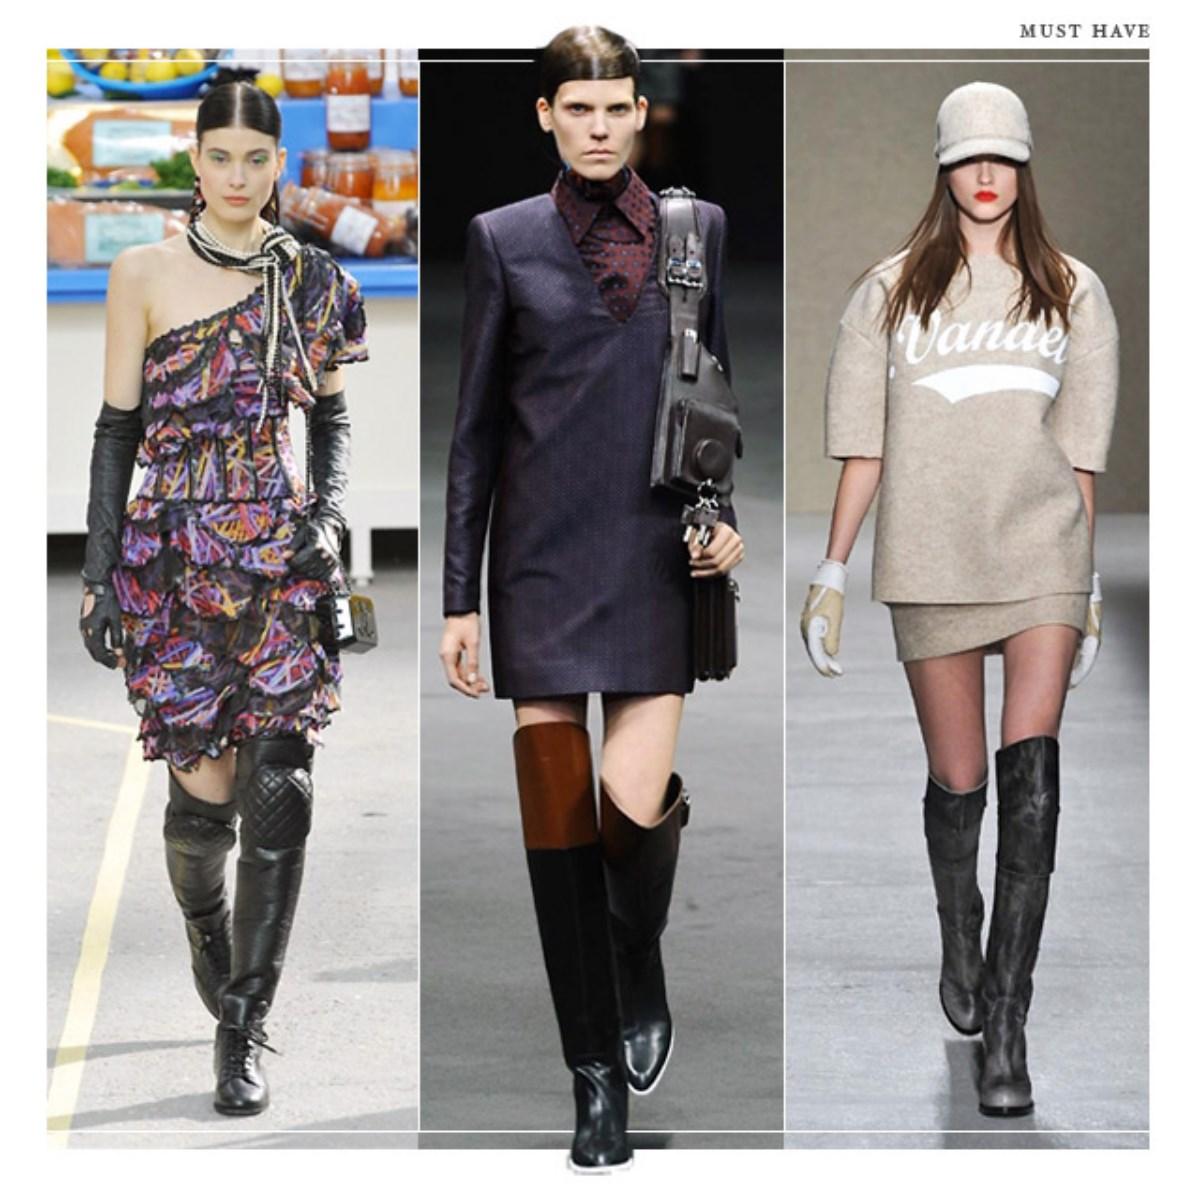 moda-acessorios-bota-cano-alto